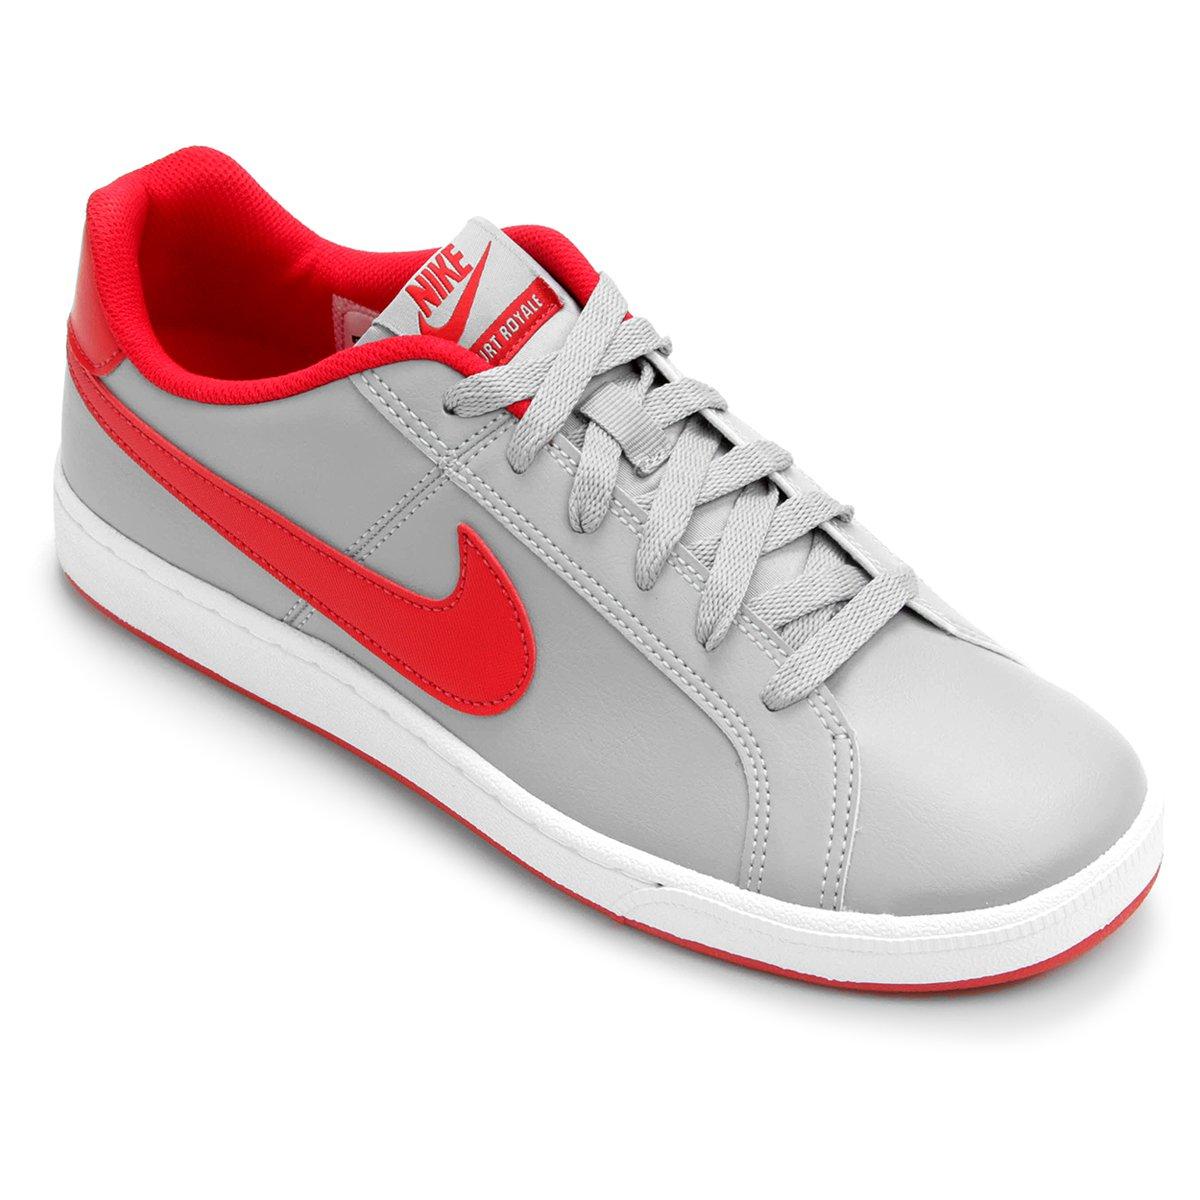 b32533add1 Tênis Couro Nike Court Royale Masculino - Cinza e Vermelho - Compre ...